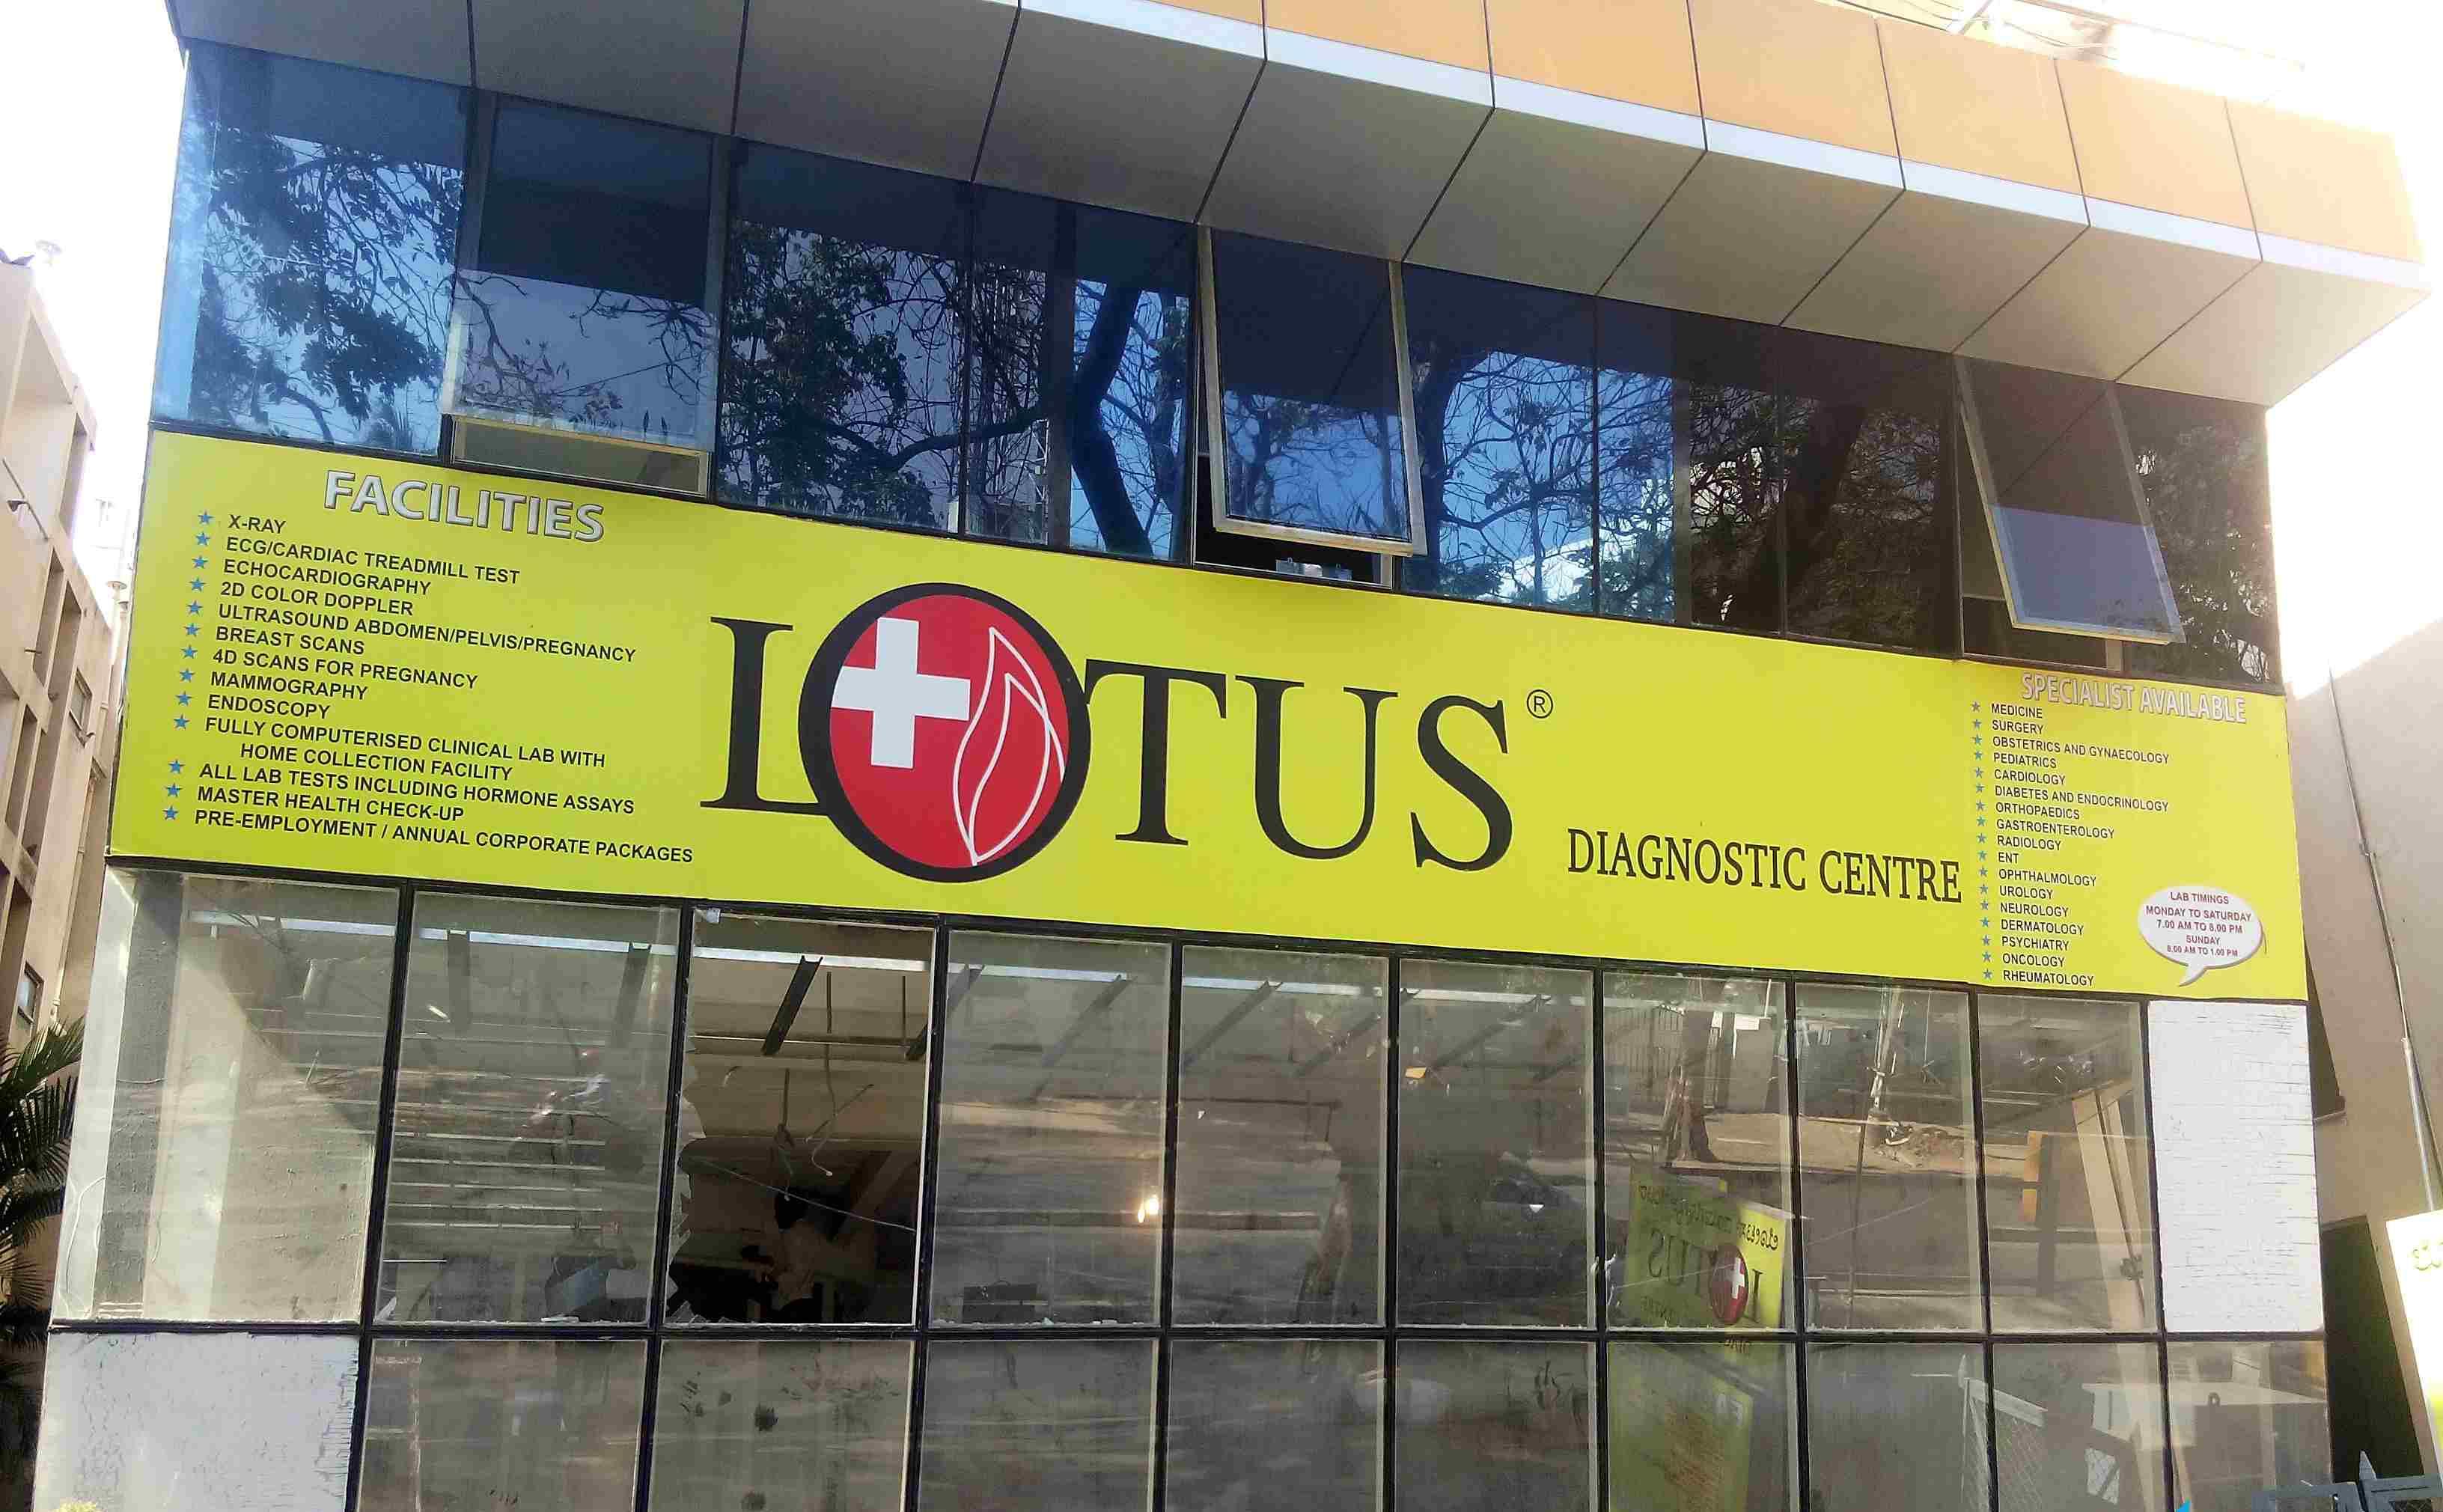 Lotus Diagnostic Centre